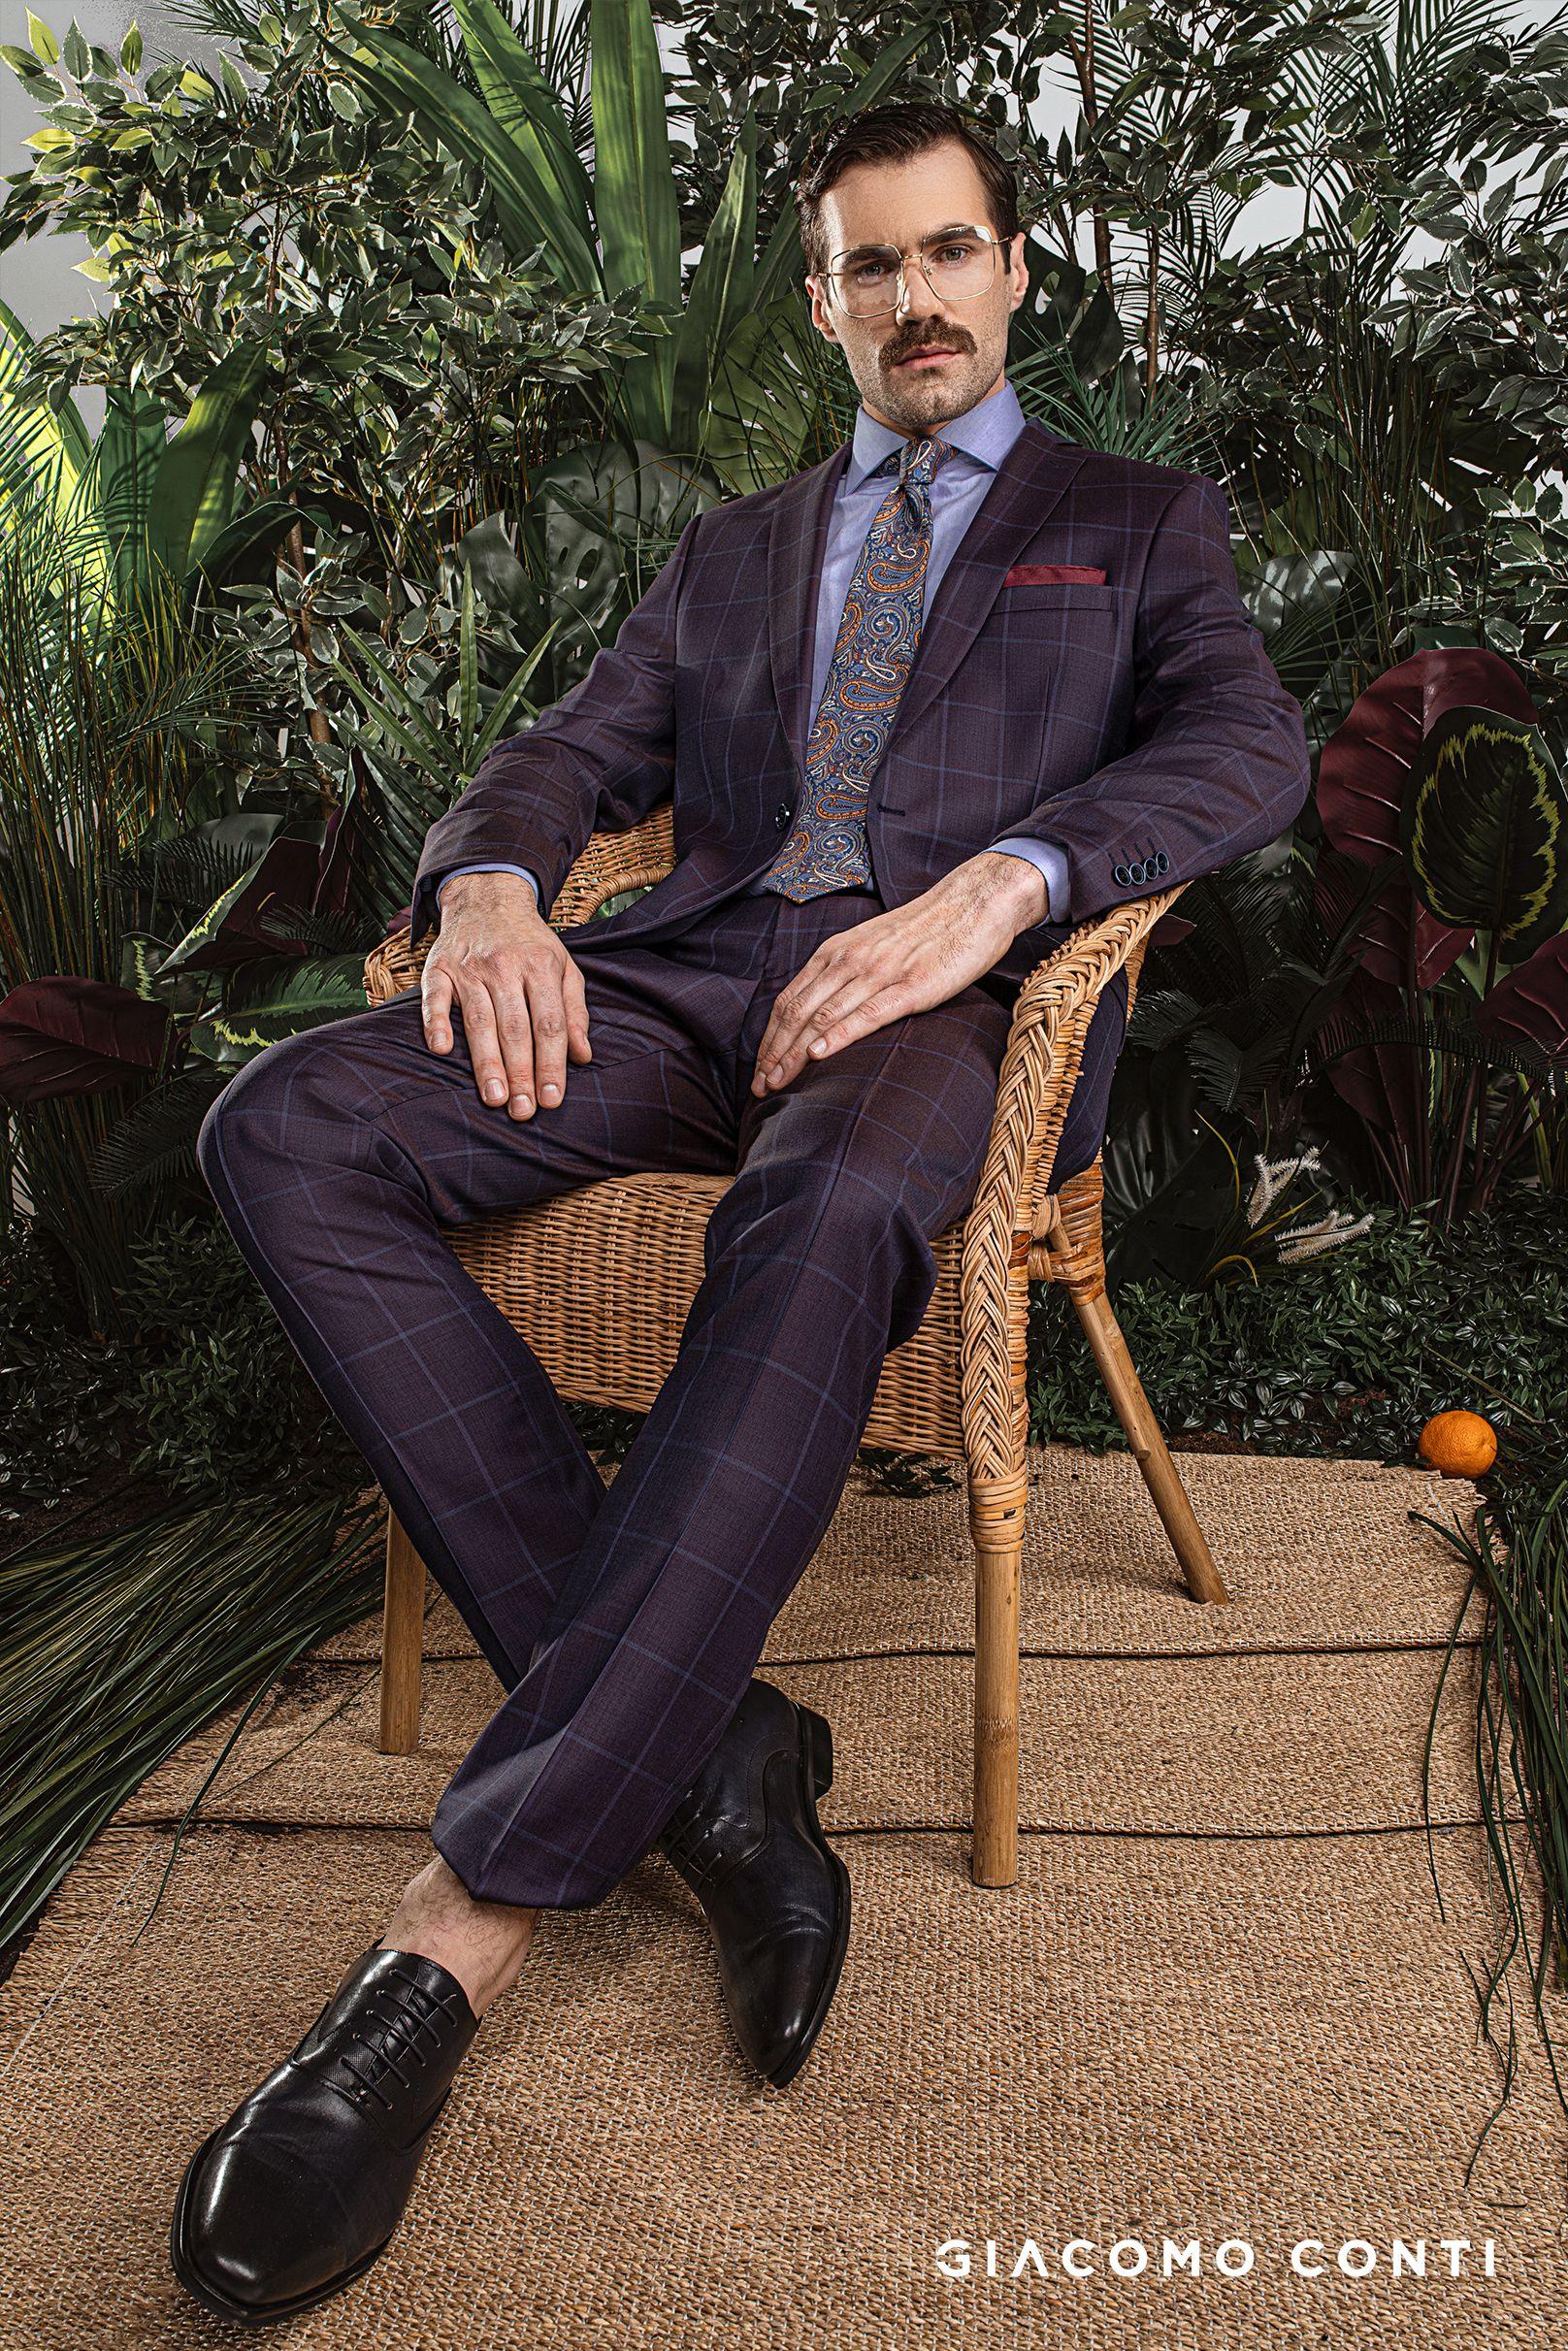 Fioletowy Garnitur W Kratke Giacomo Conti Style Mens Fashion Fashion